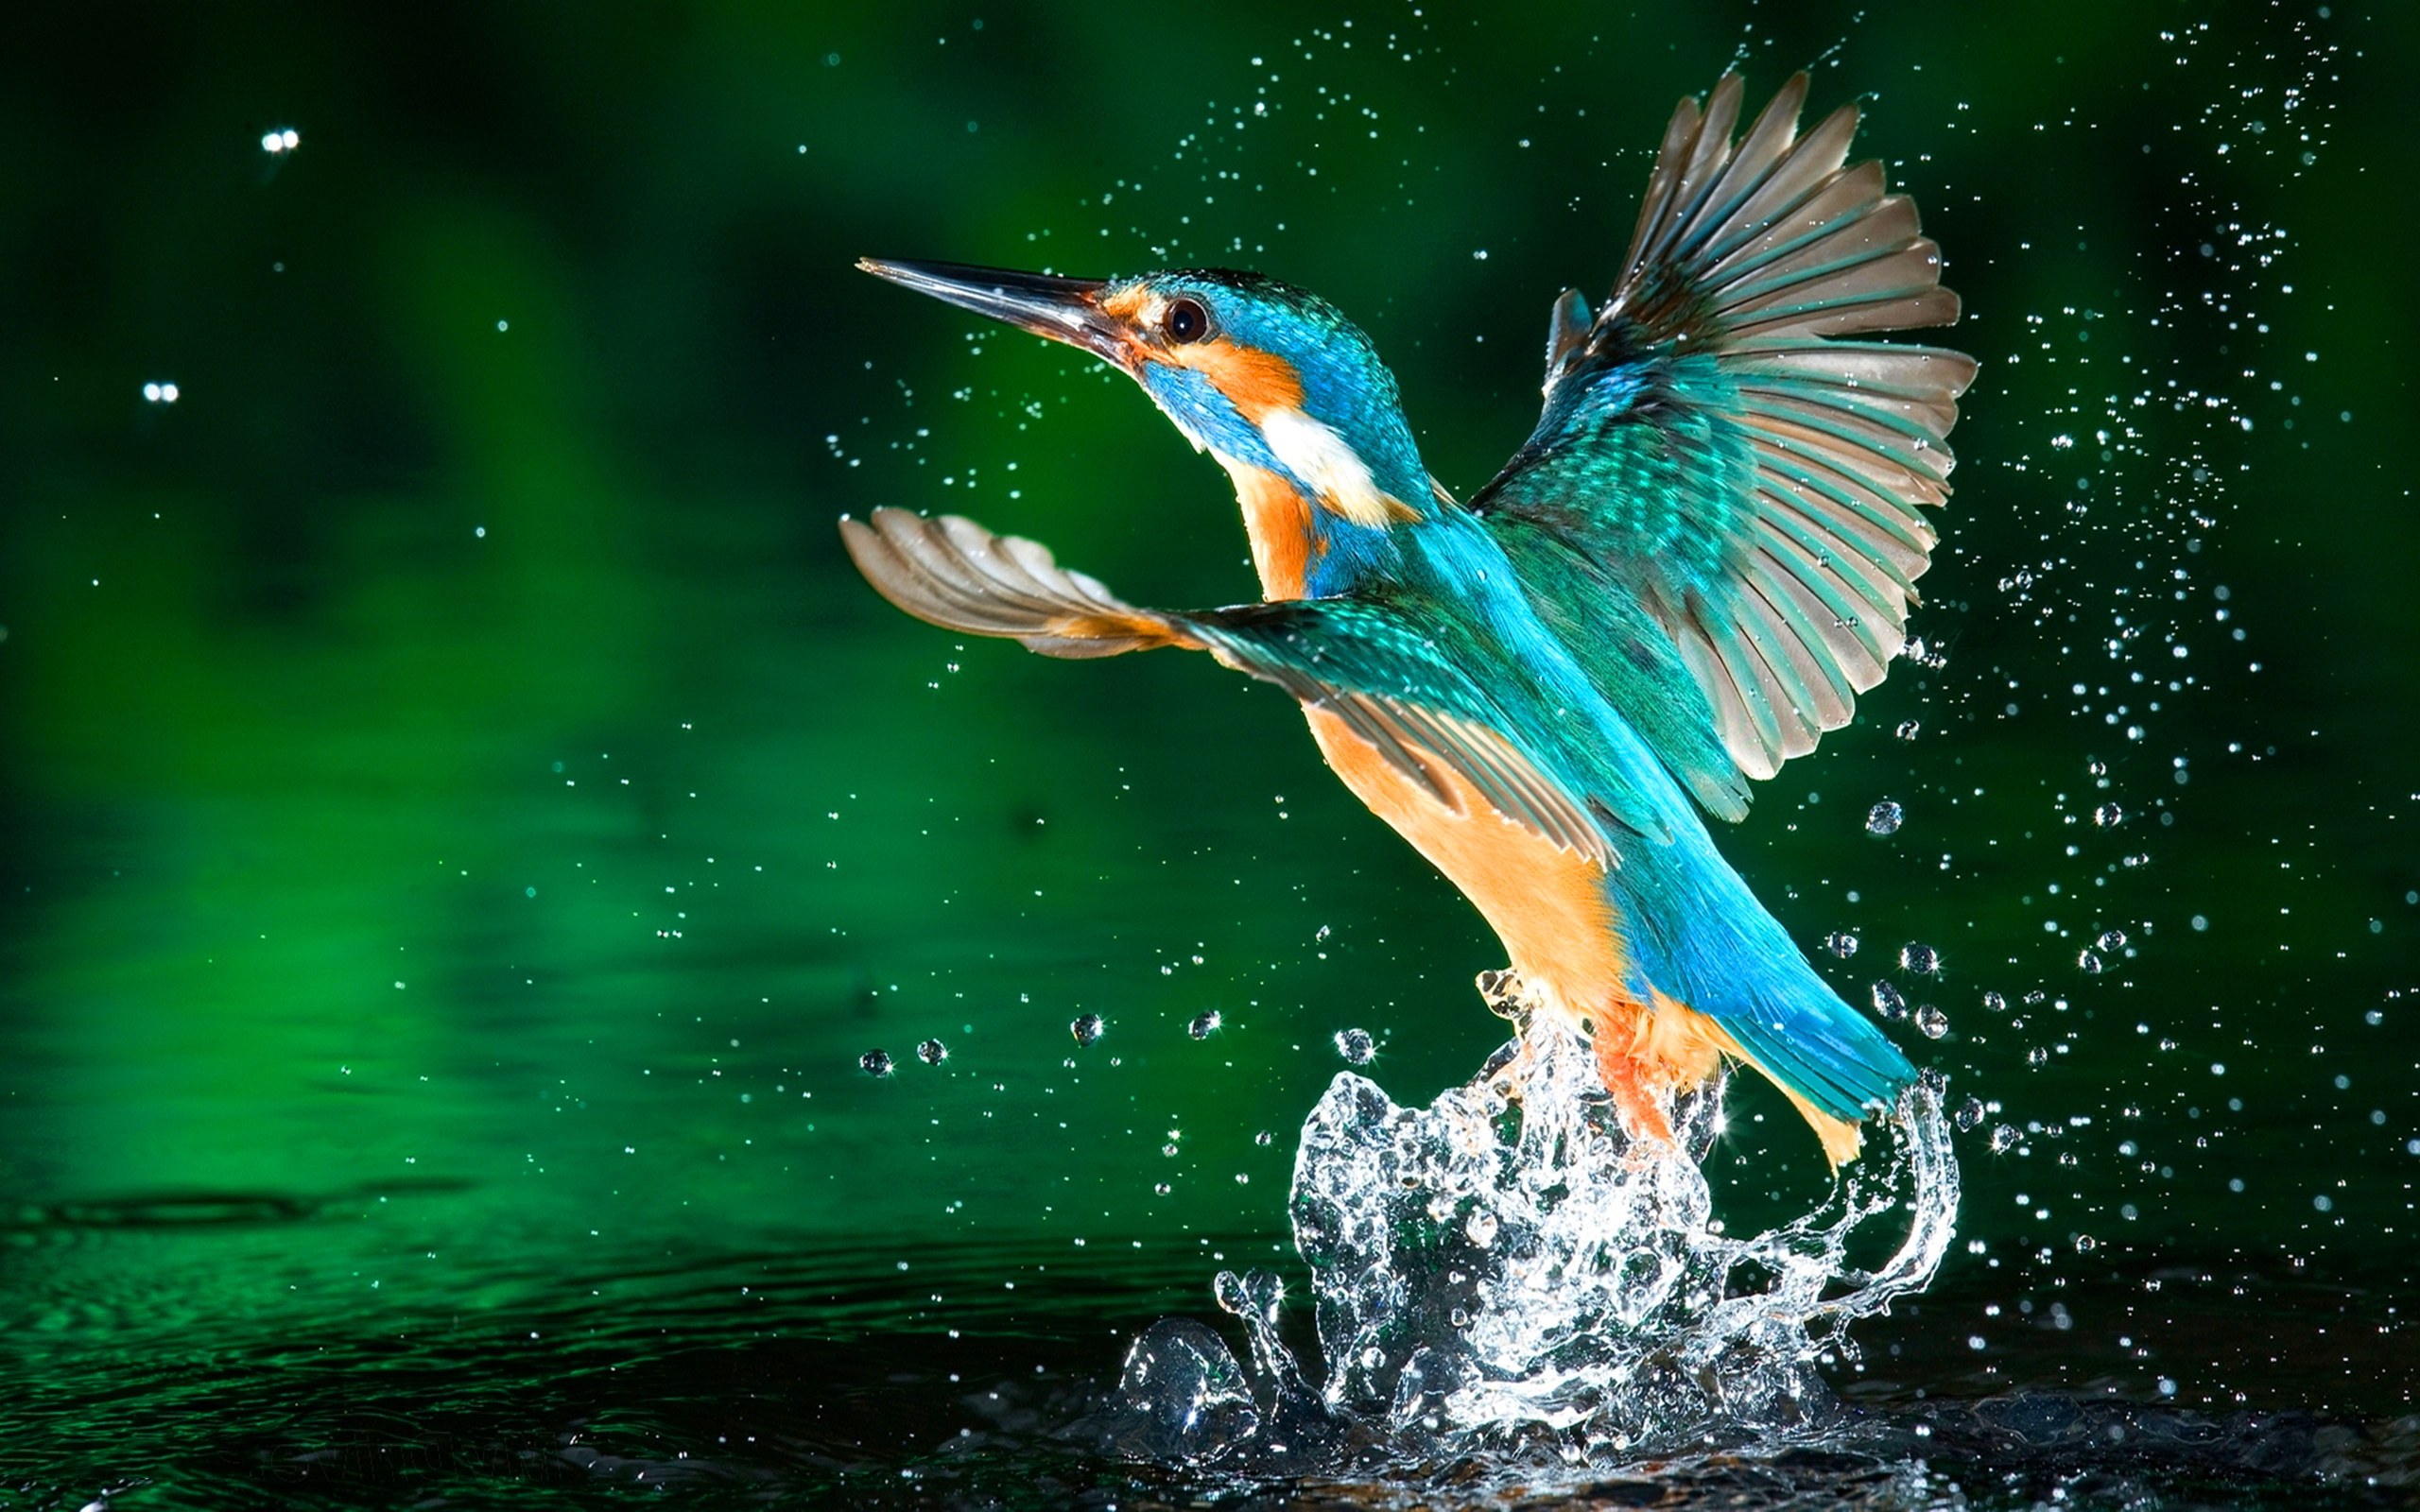 Kingfisher water